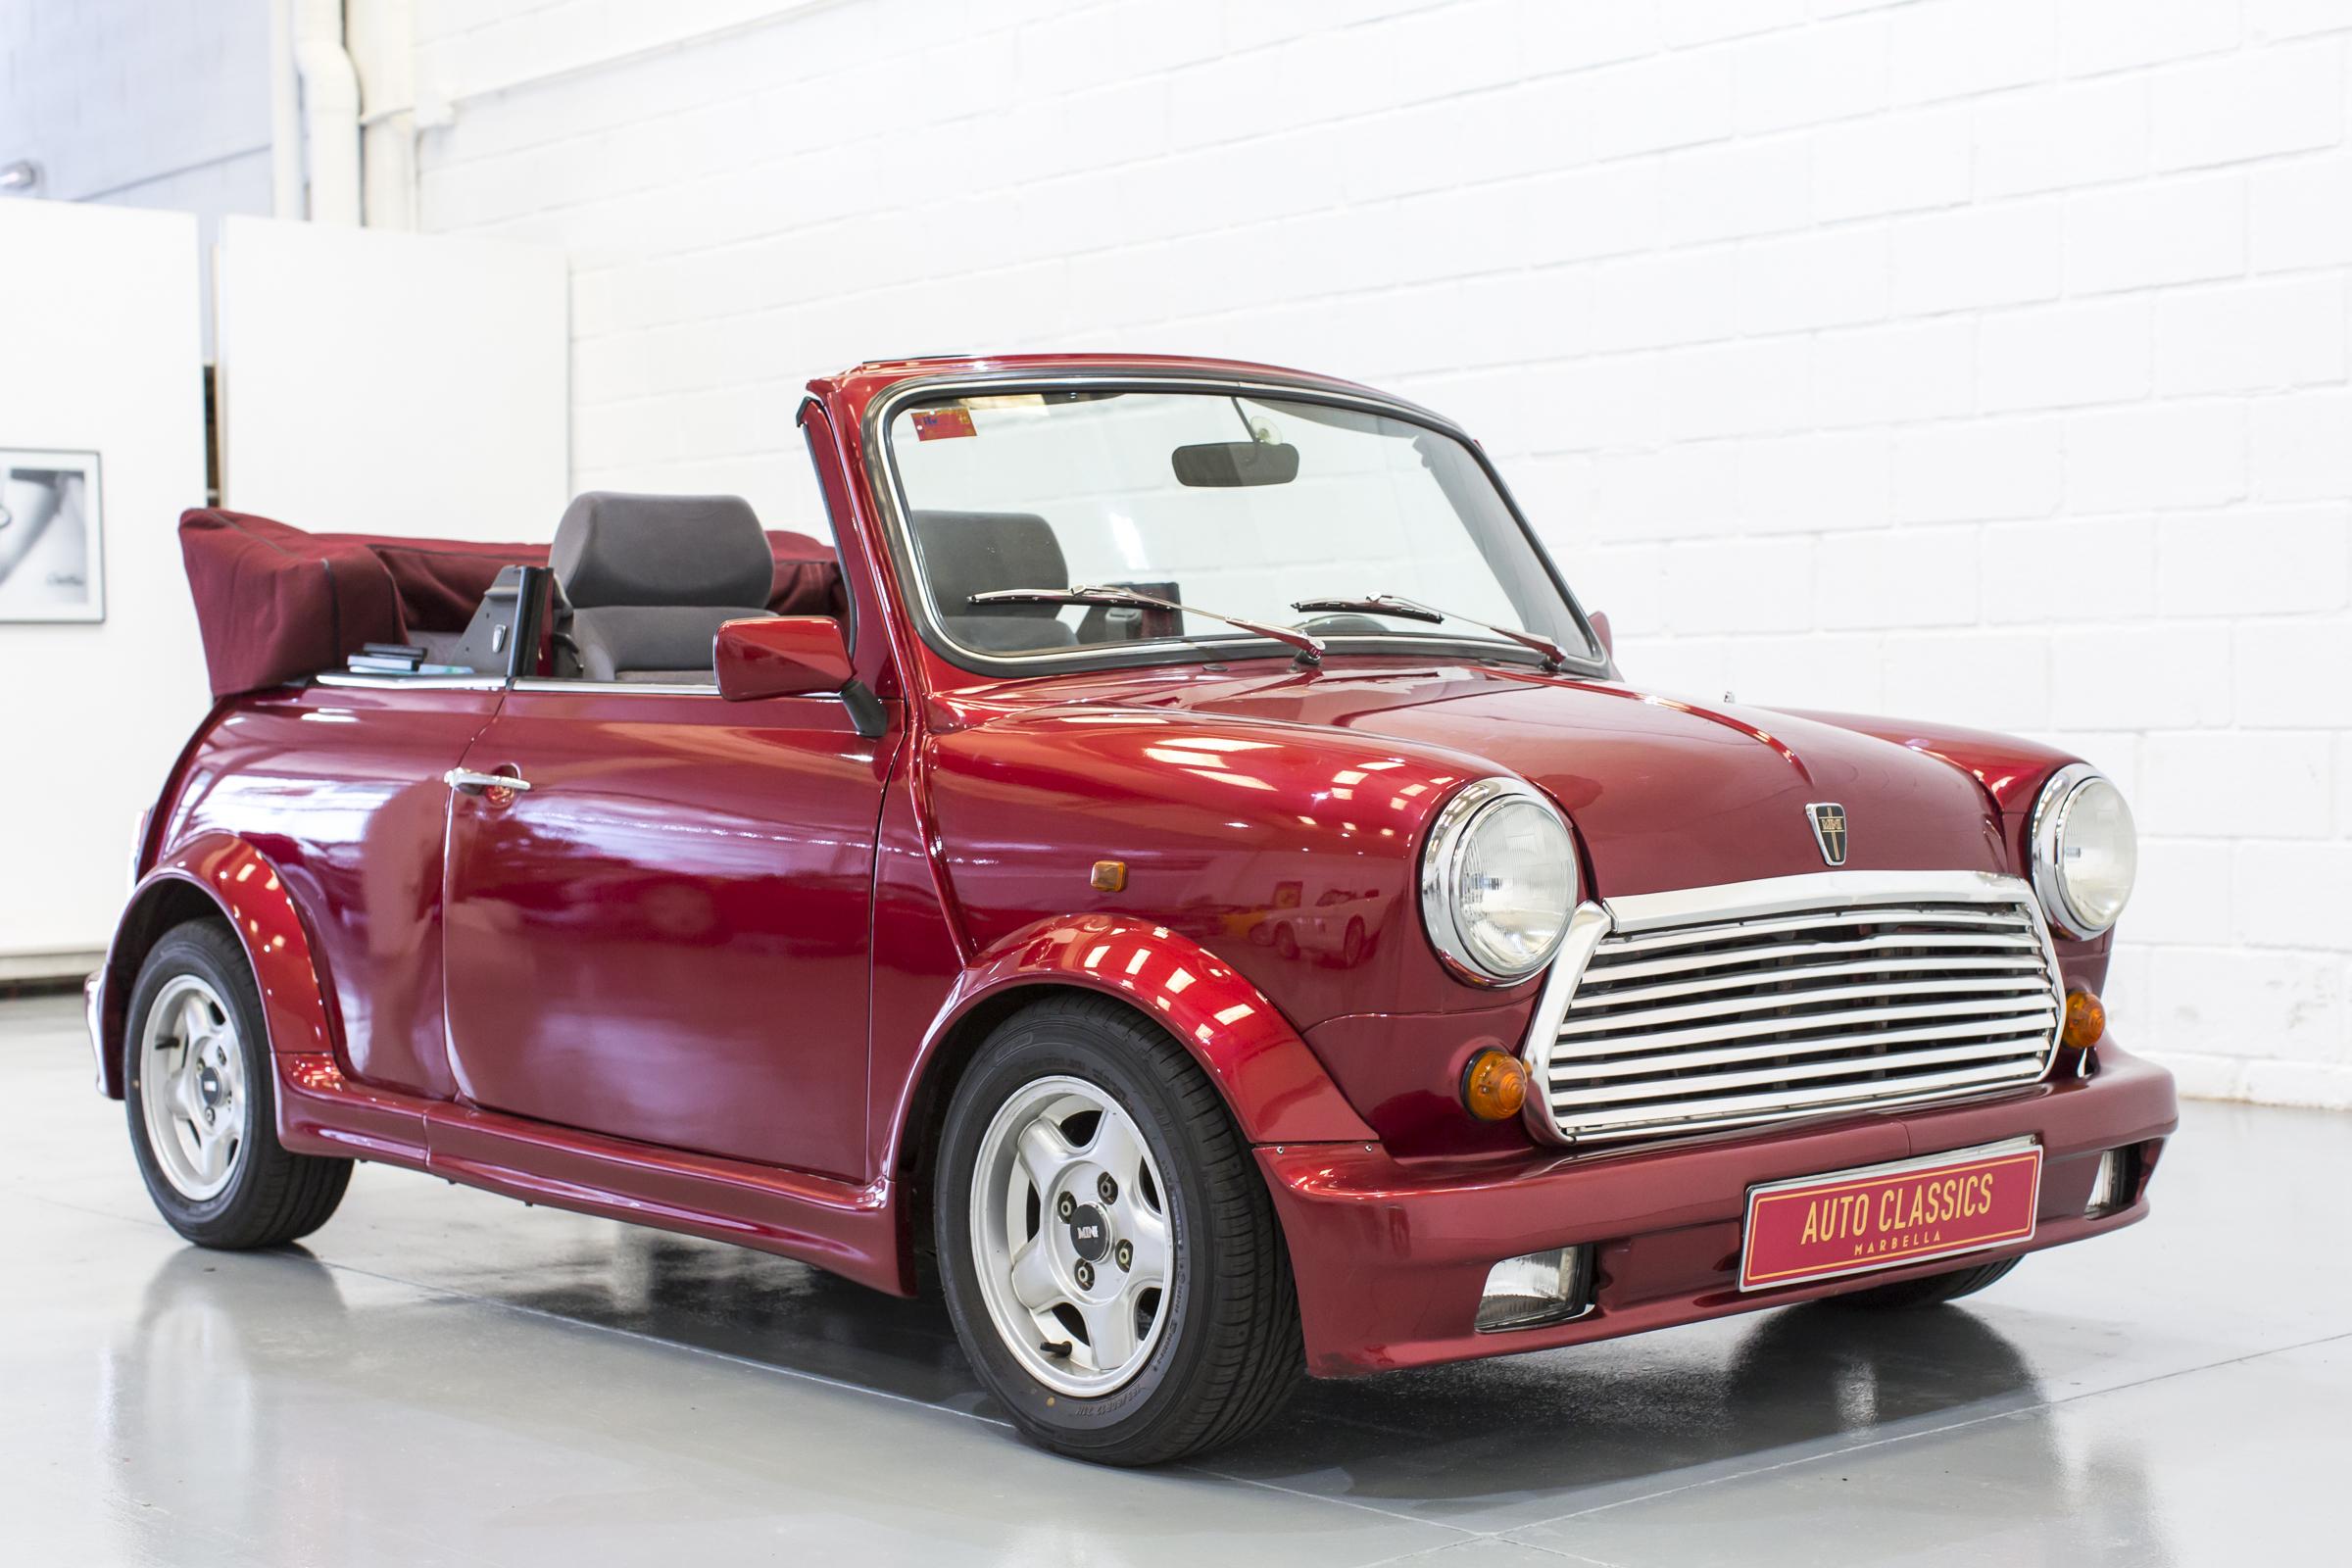 austin rover mini cabriolet uz edition auto classics marbella. Black Bedroom Furniture Sets. Home Design Ideas